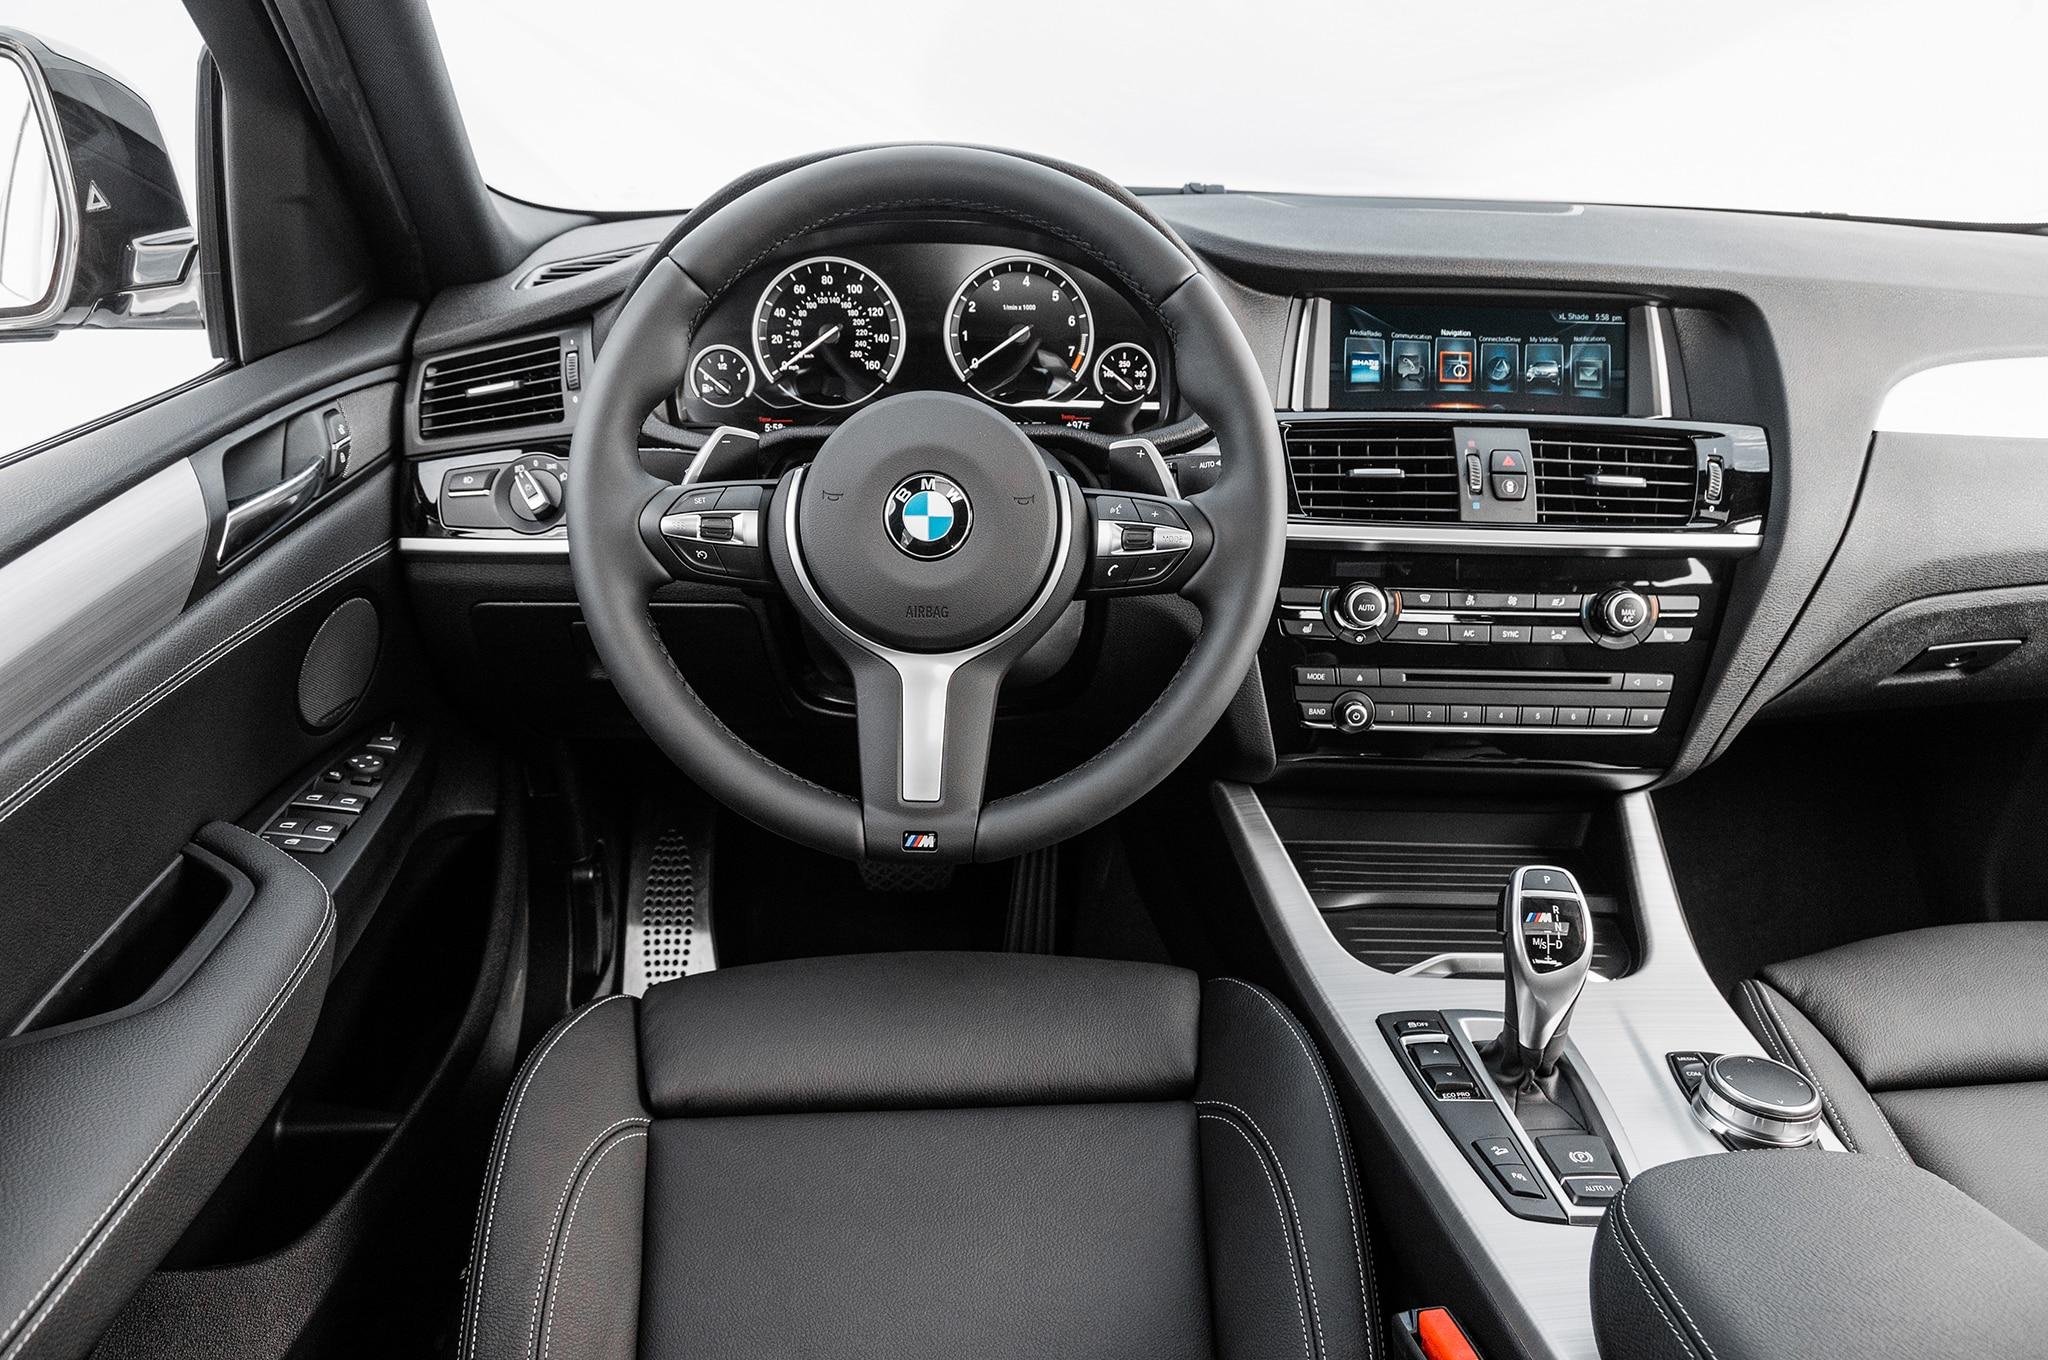 Dodge Durango Mpg >> 2018 BMW X4 xDrive28i interior - Motor Trend en Español